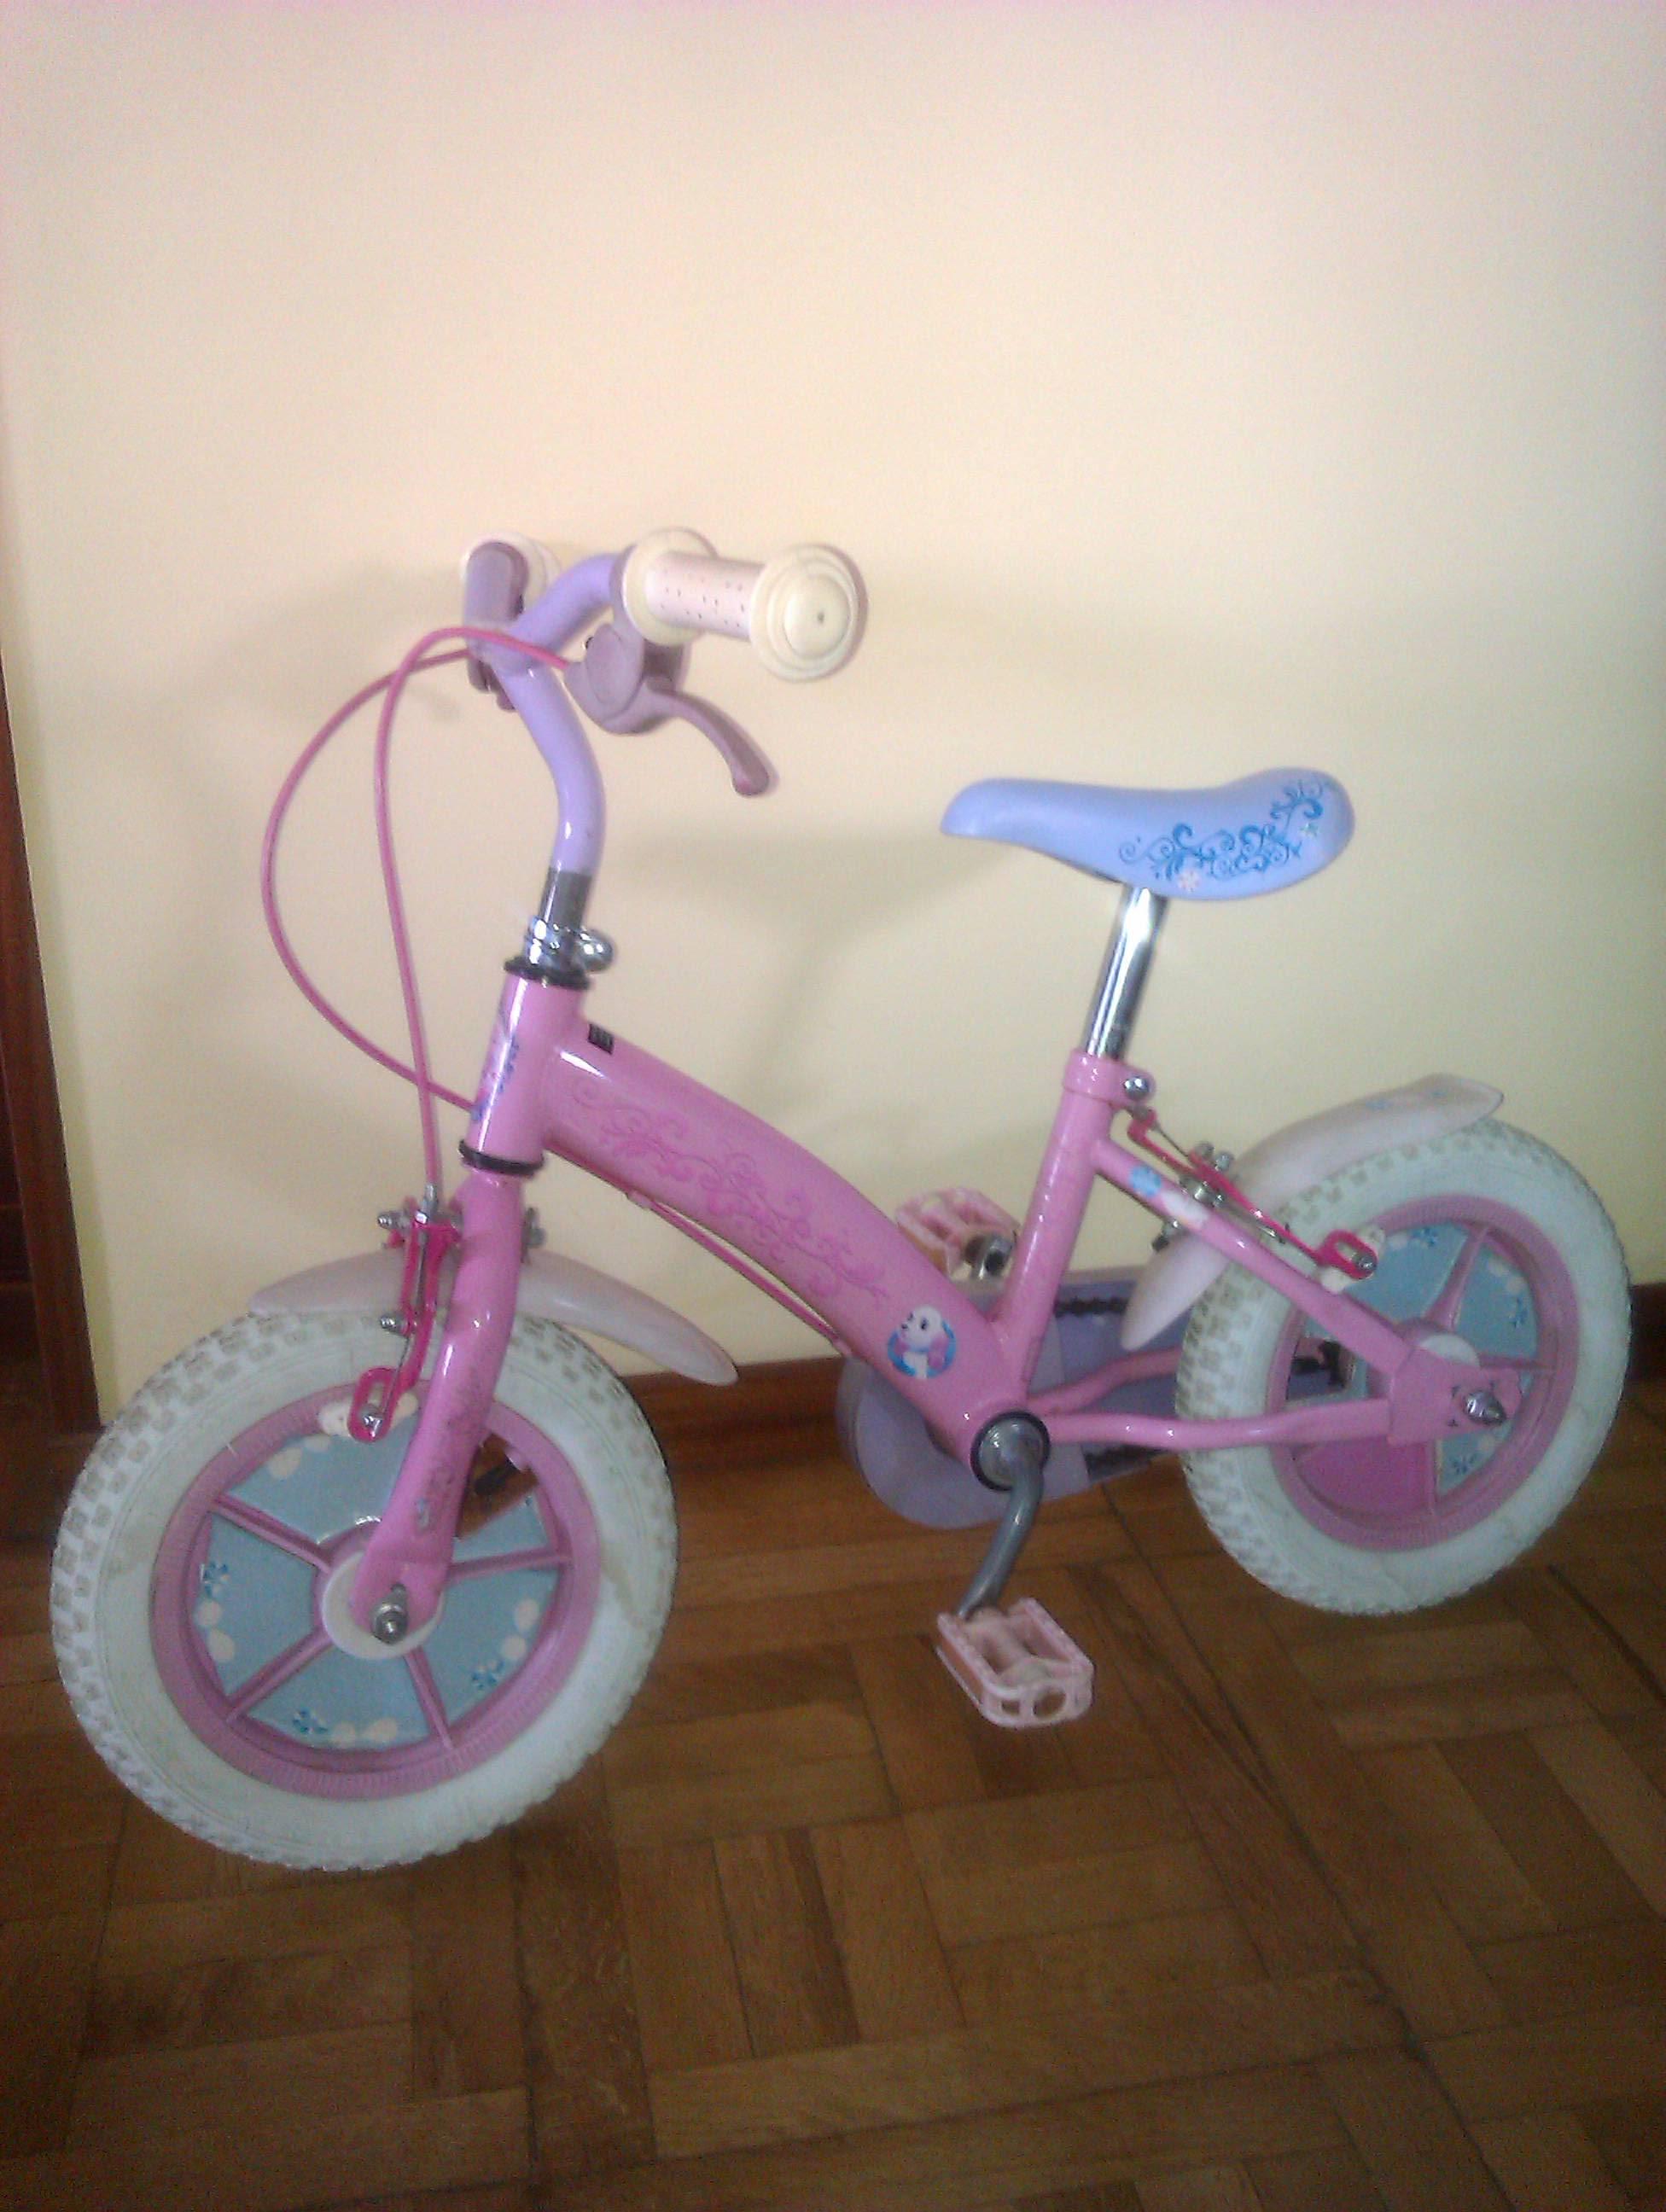 Bicicleta de niña pequeña. Madrid - Madrid